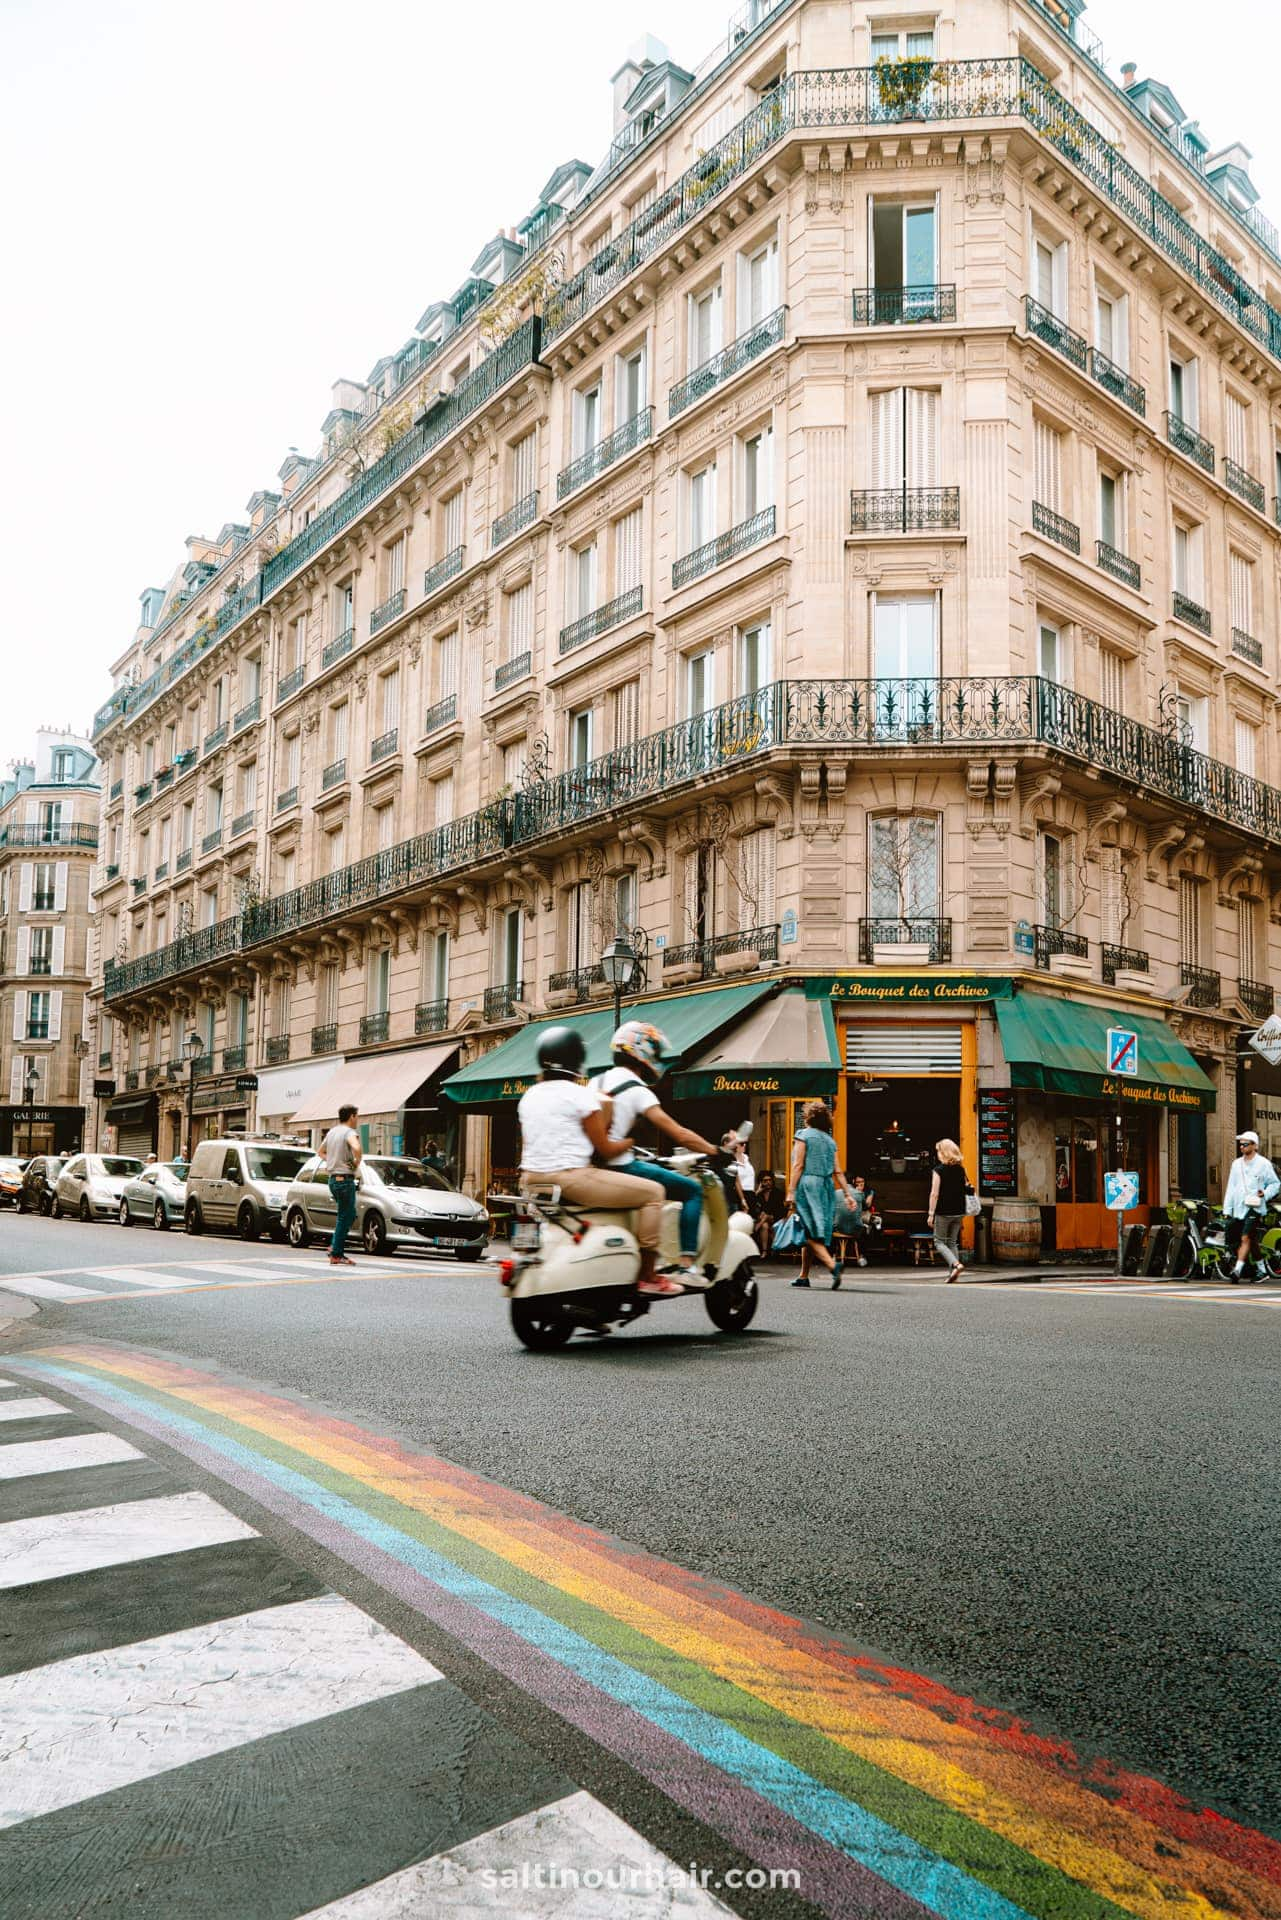 paris street aesthetic